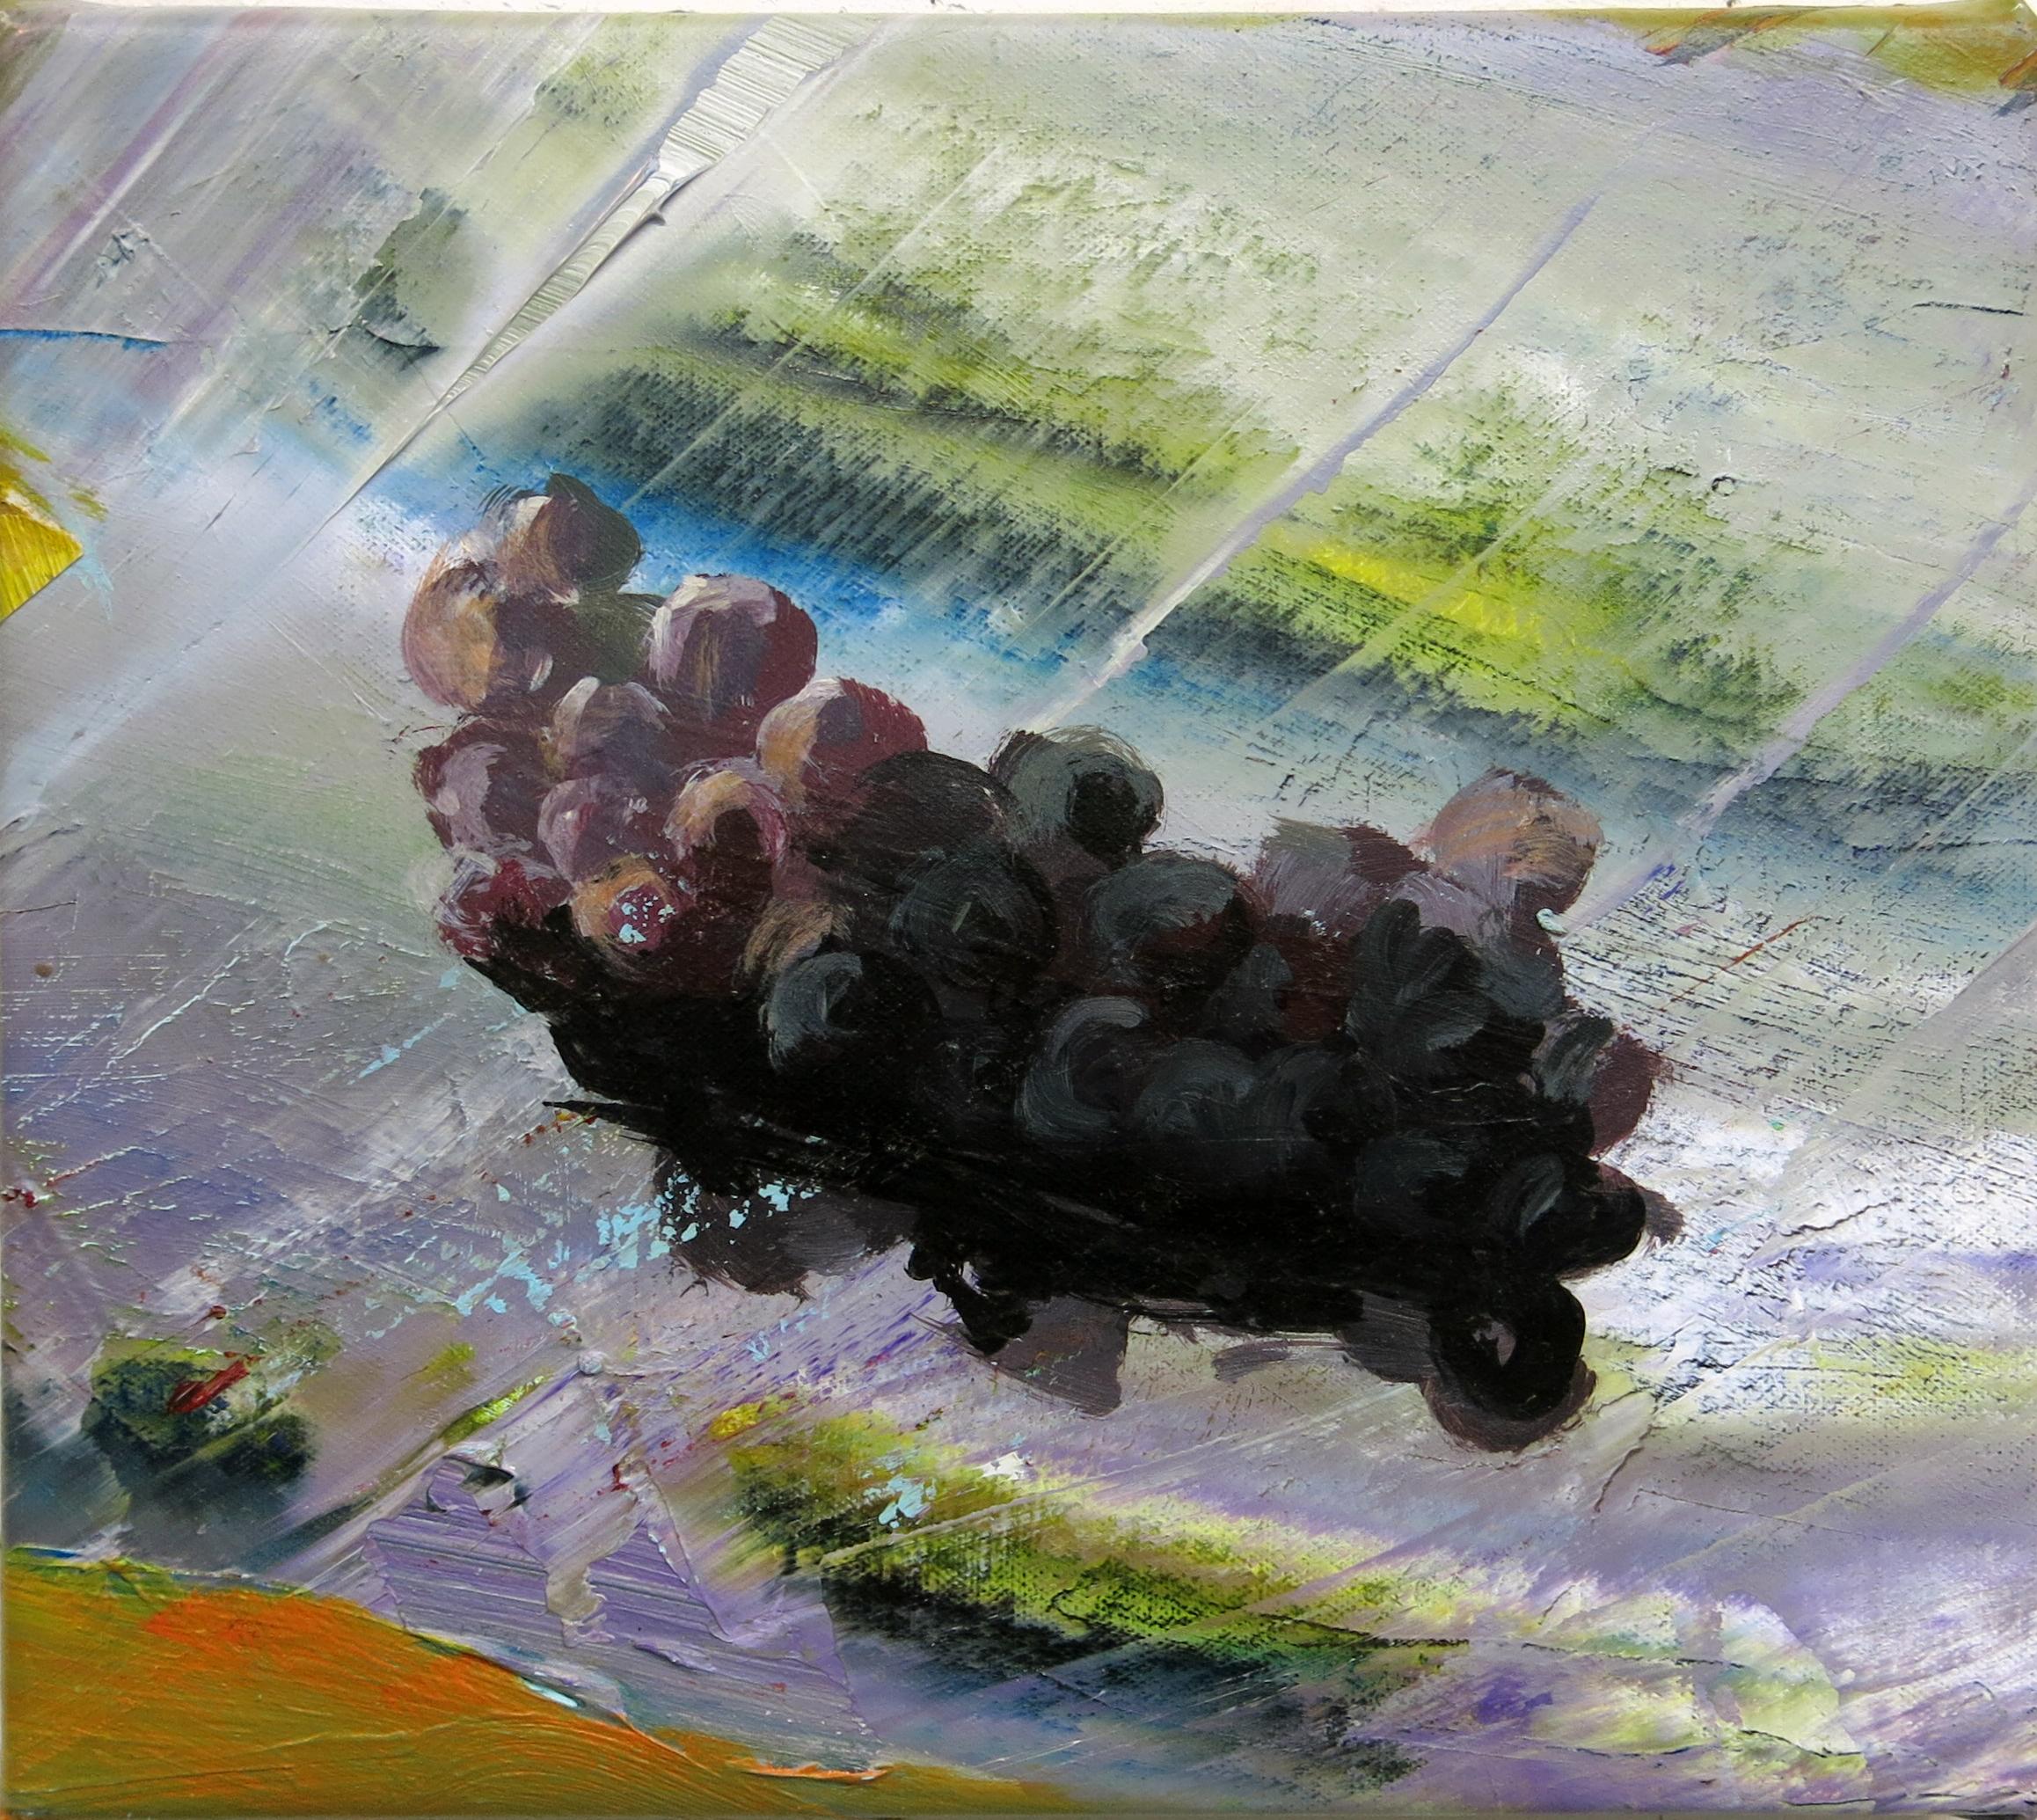 Judith Simonian, In the Rapids, 2014, acrylic on panel, 8h x 10w in.